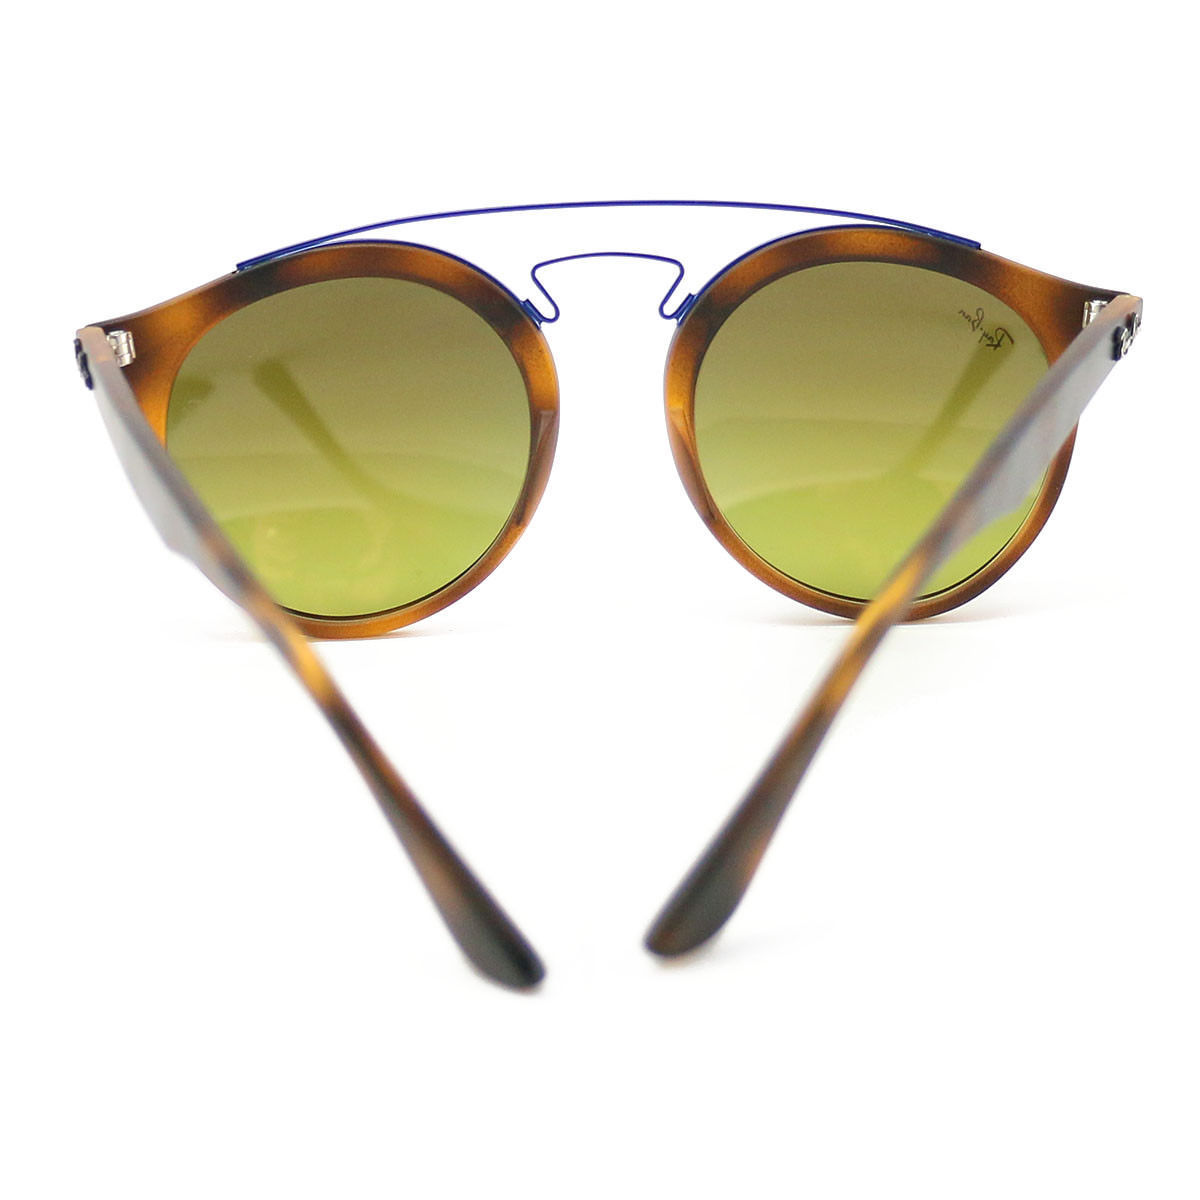 9352c11cc937e New Ray-Ban Sunglasses RB4256 6266B0 Non-Polarized 49 20 150 Matte Havana